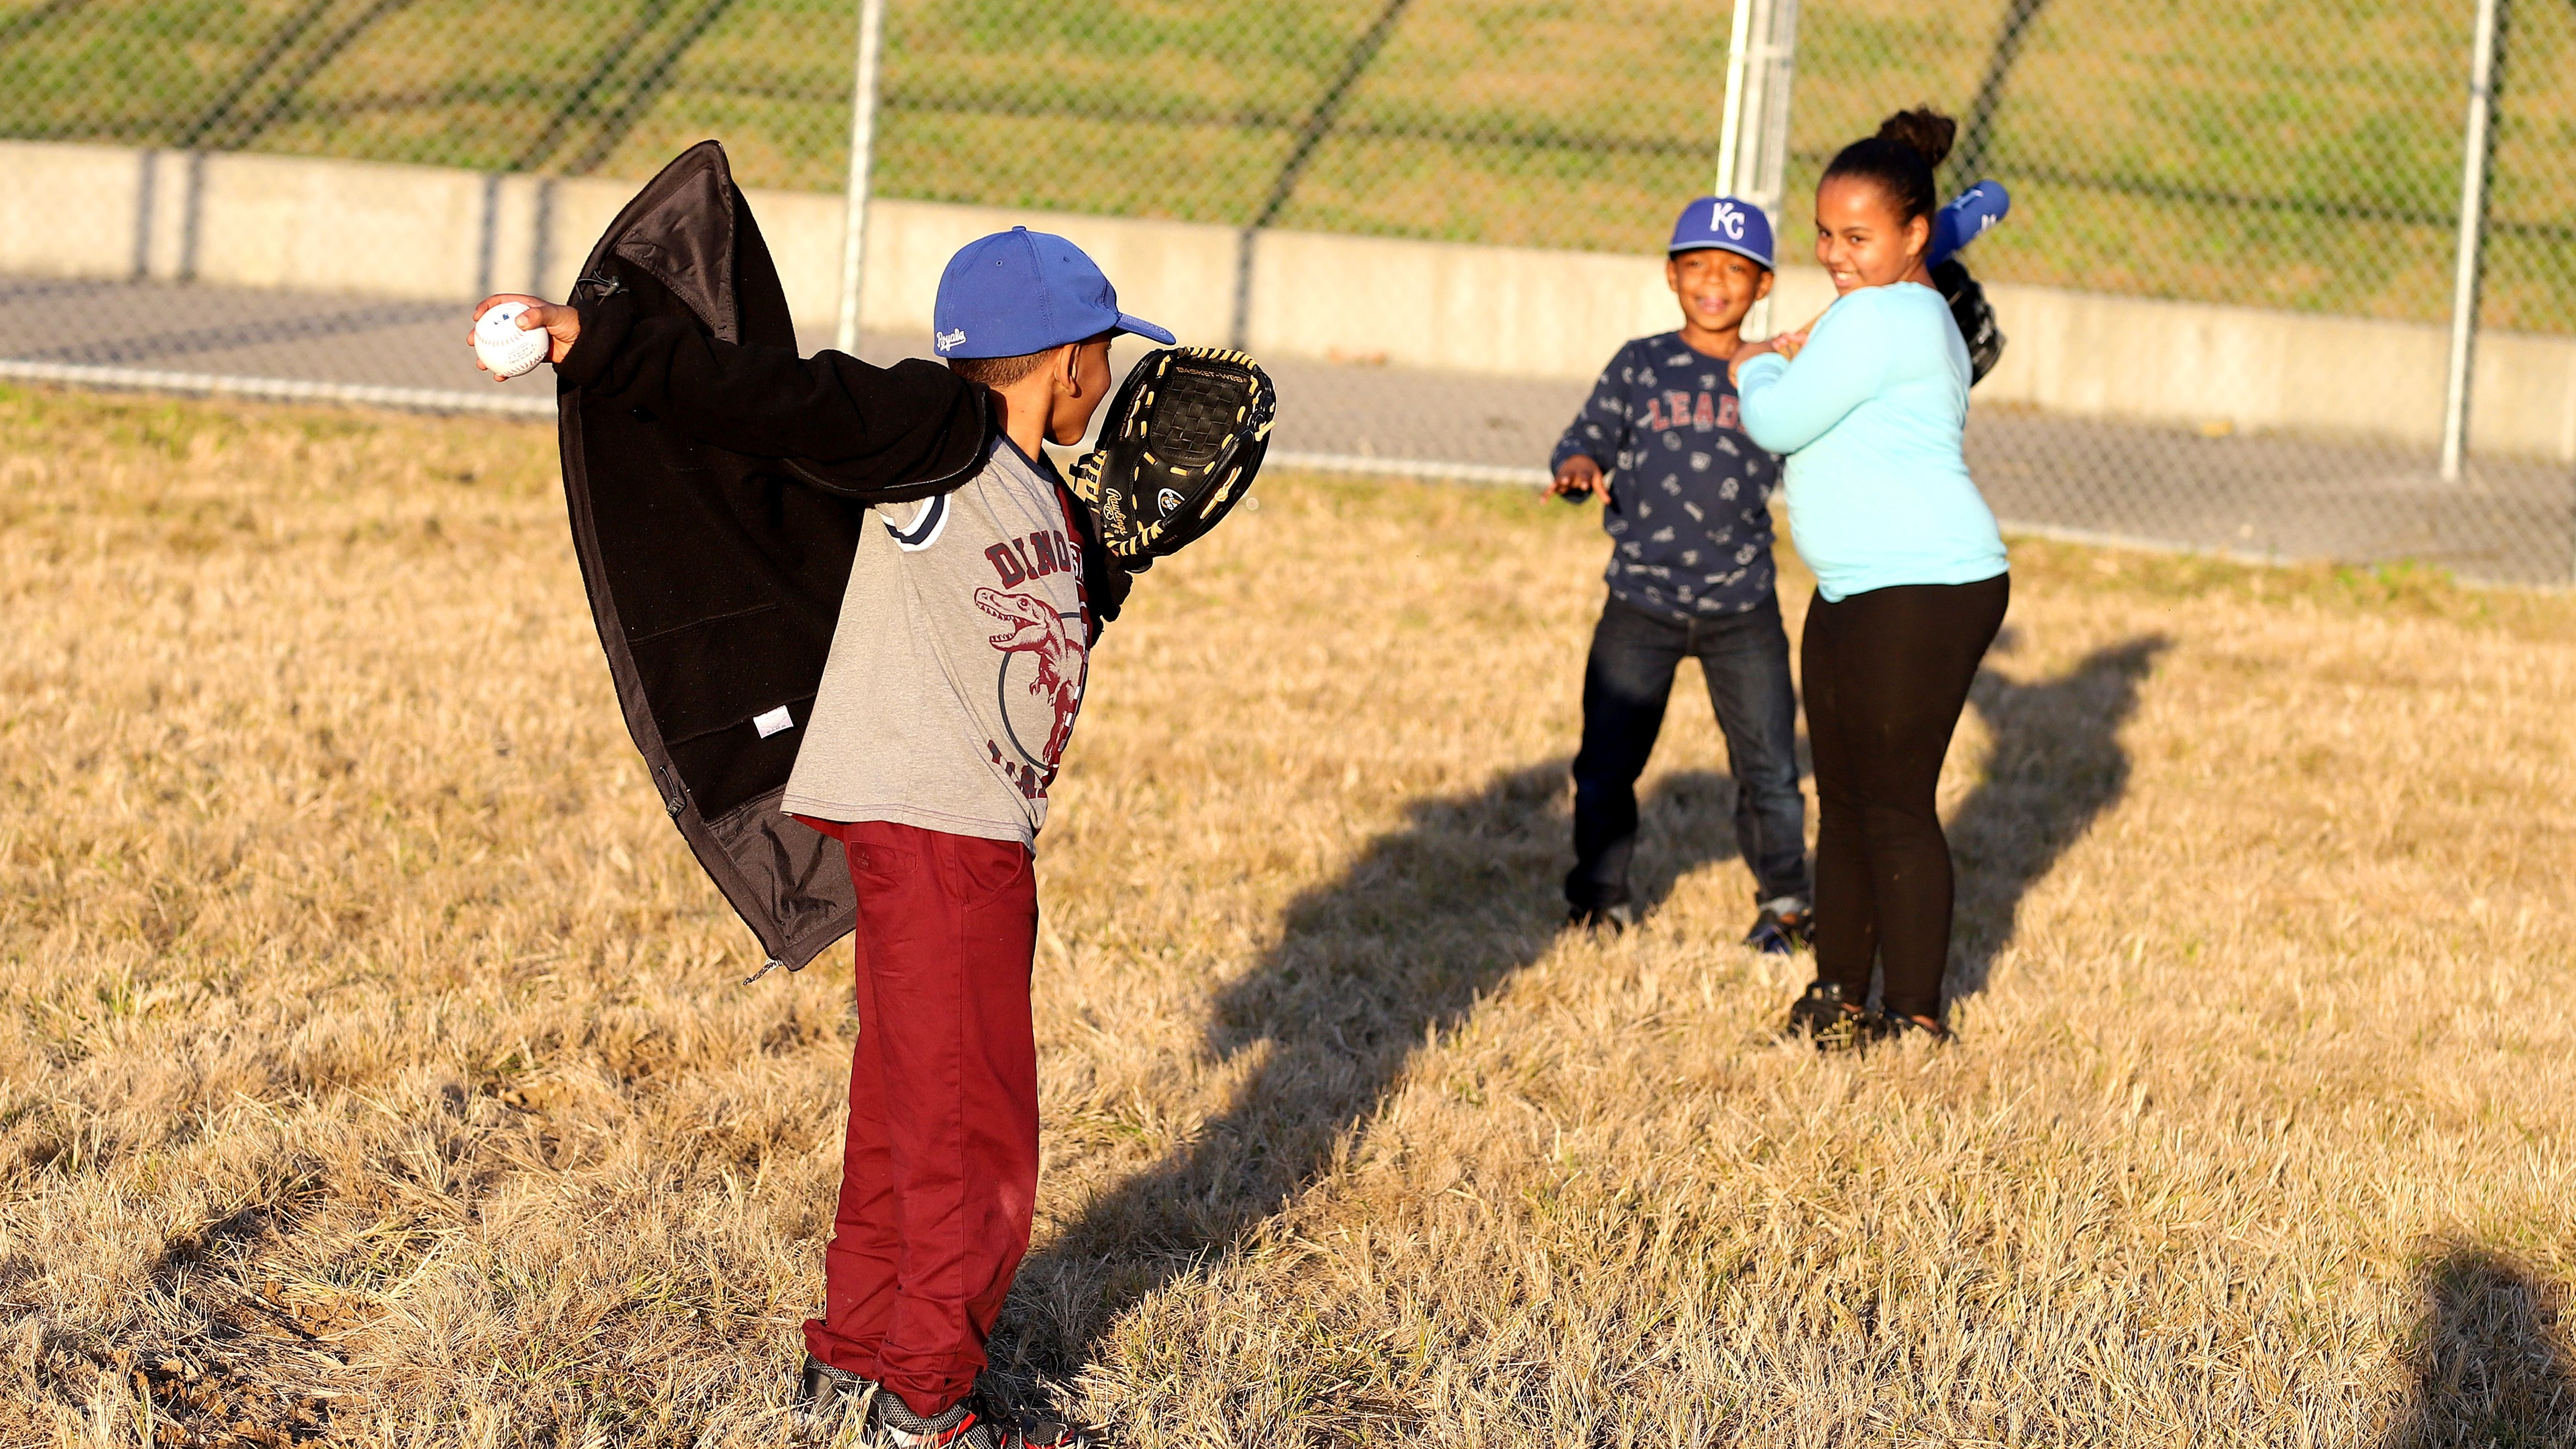 Kids playing baseball wearing KC gear